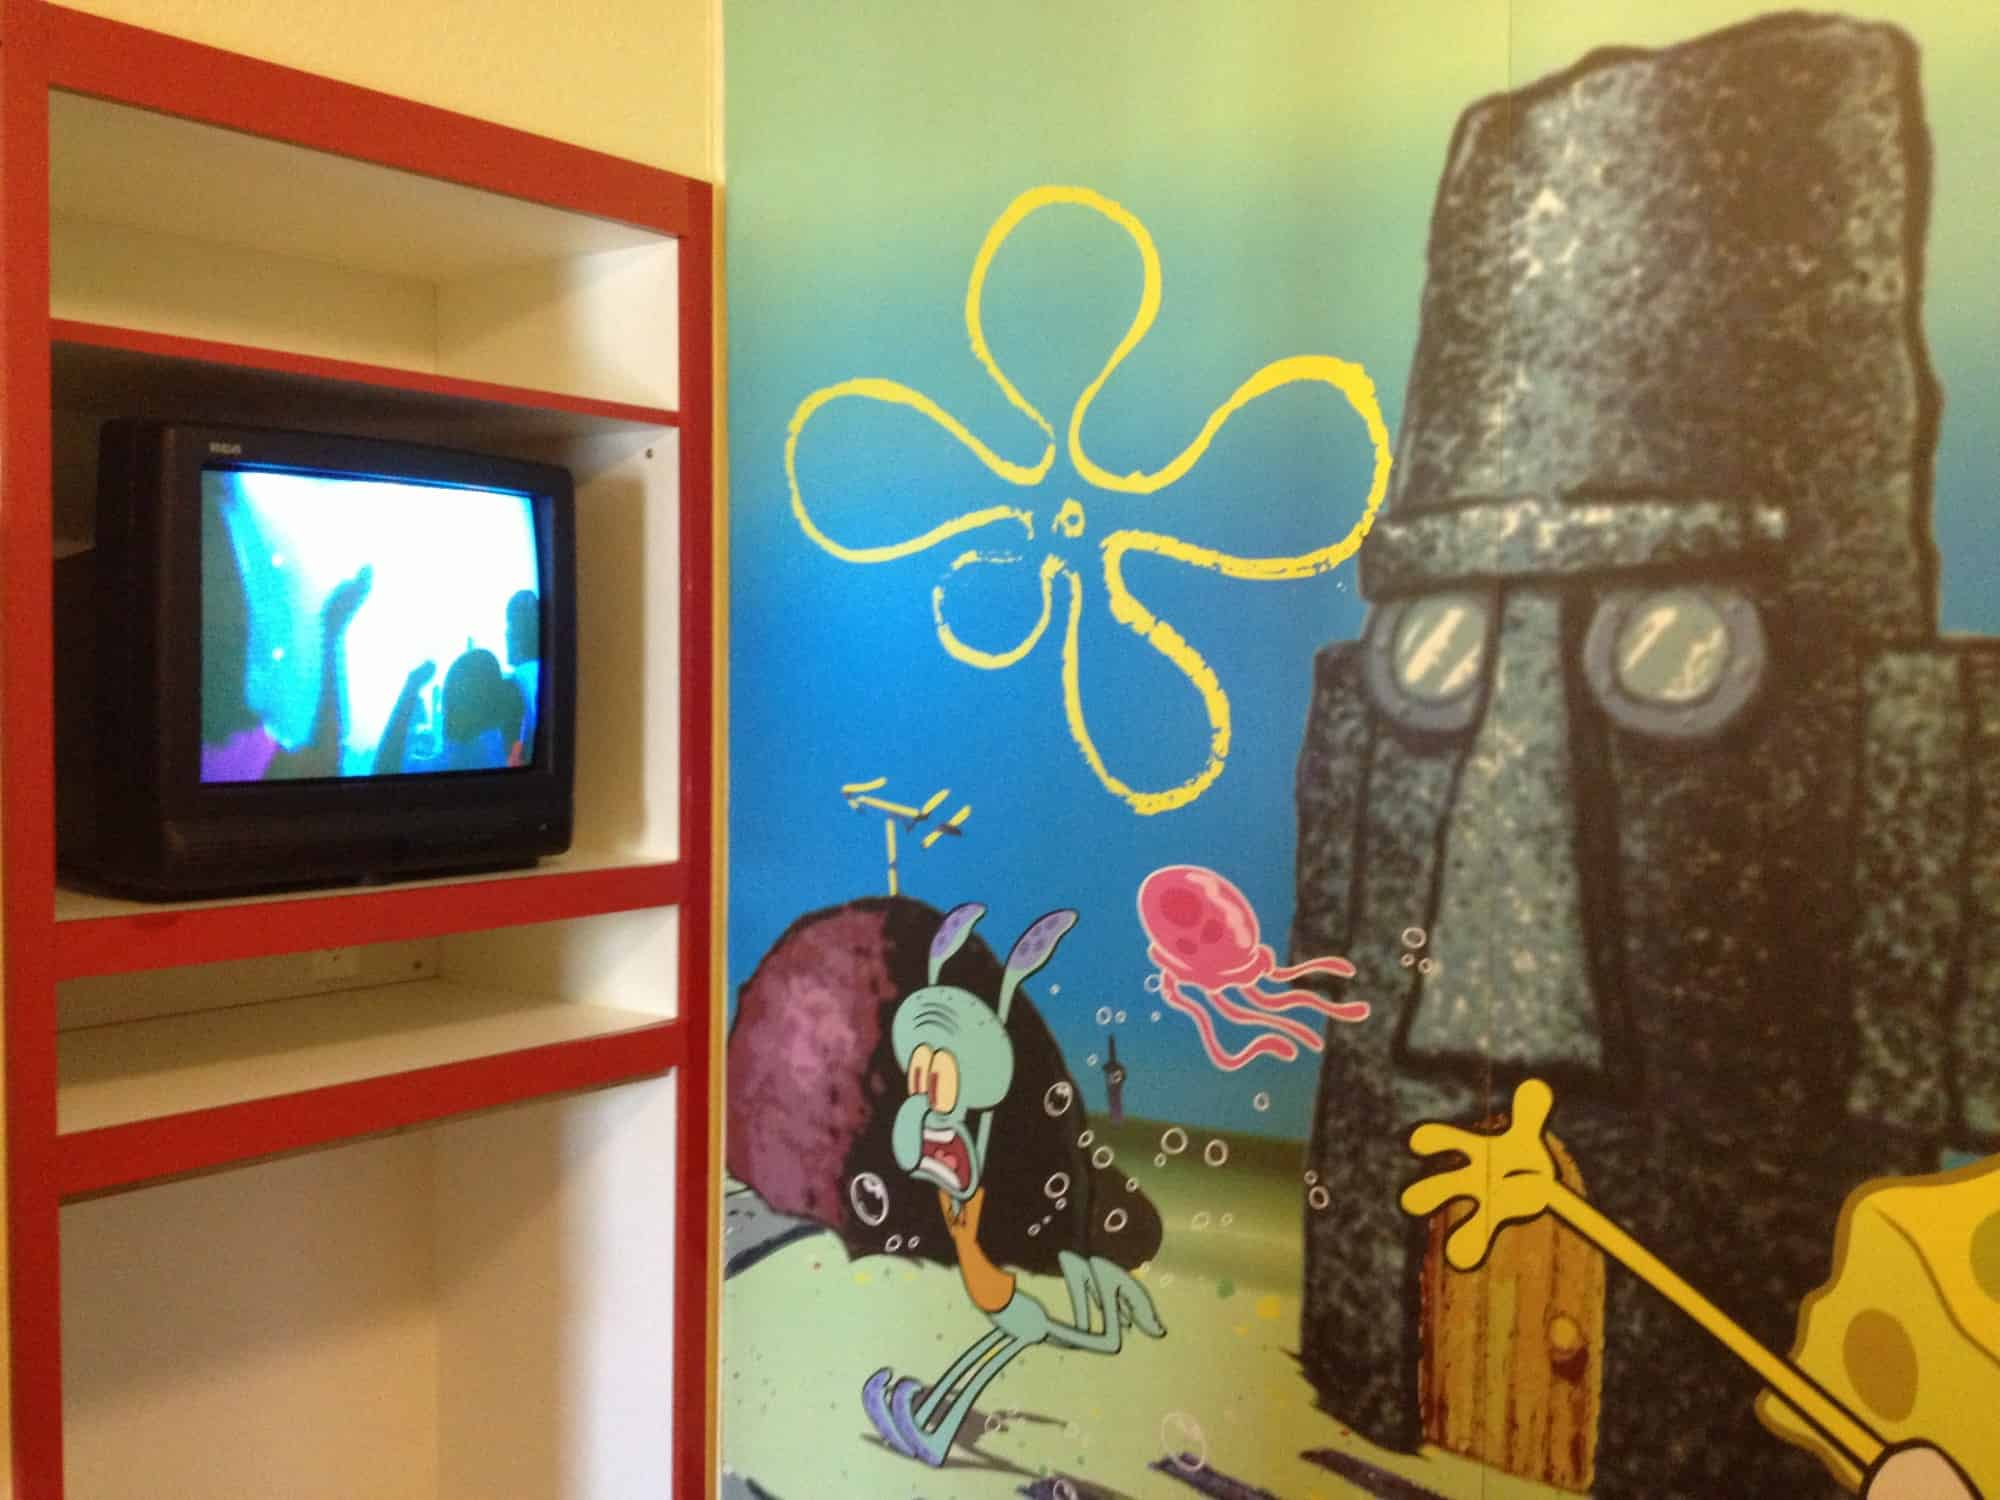 Spongebob Theme Bedroom Most Favored Home Design